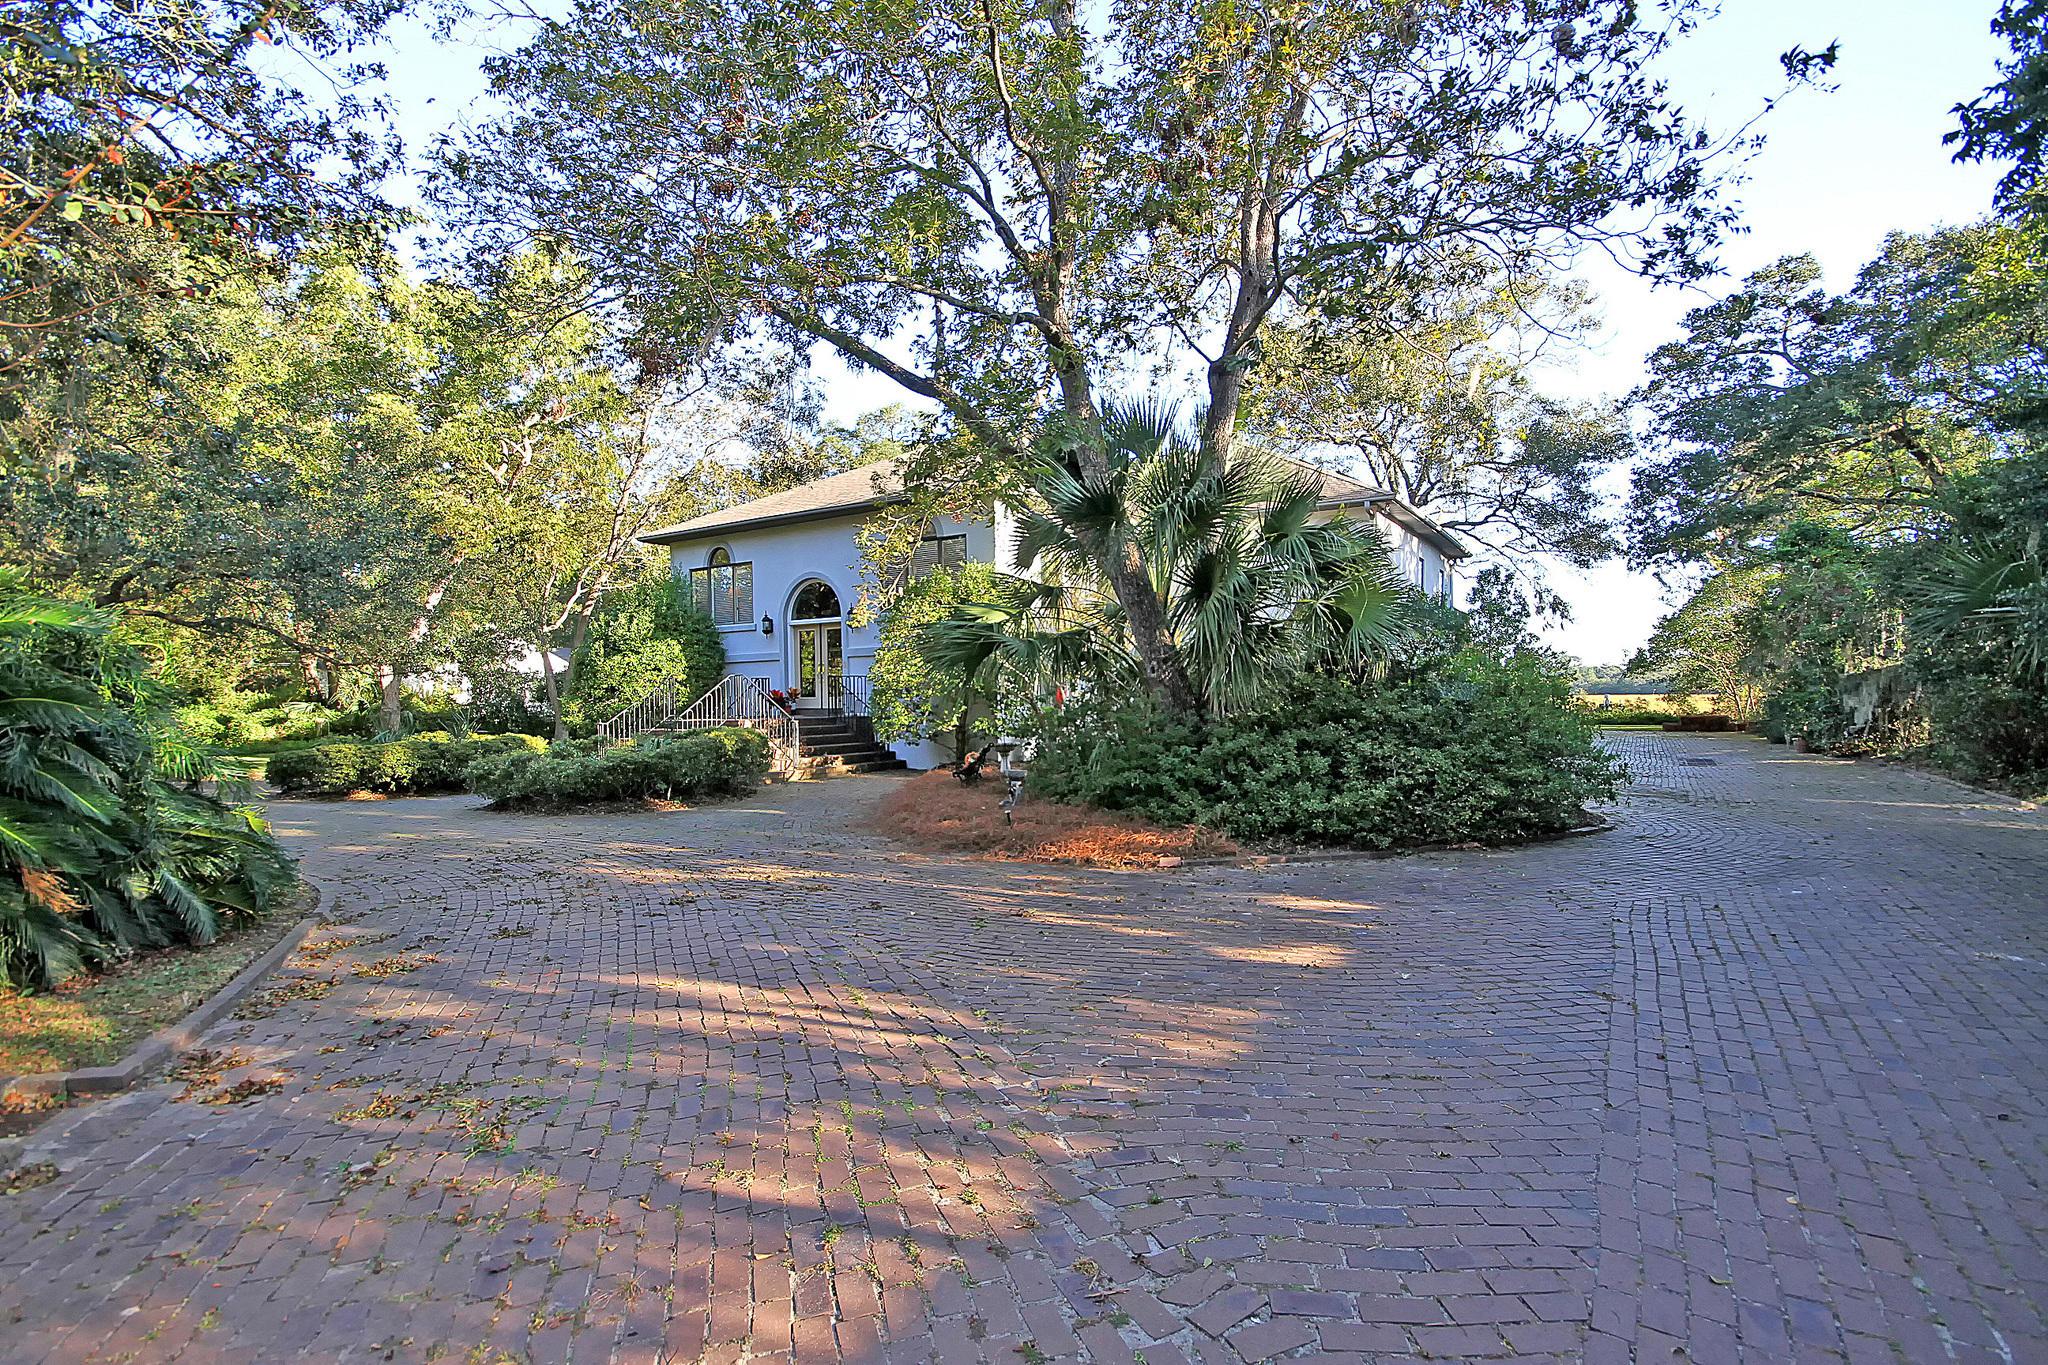 Photo of 1332 N Edgewater Dr, Charleston, SC 29407